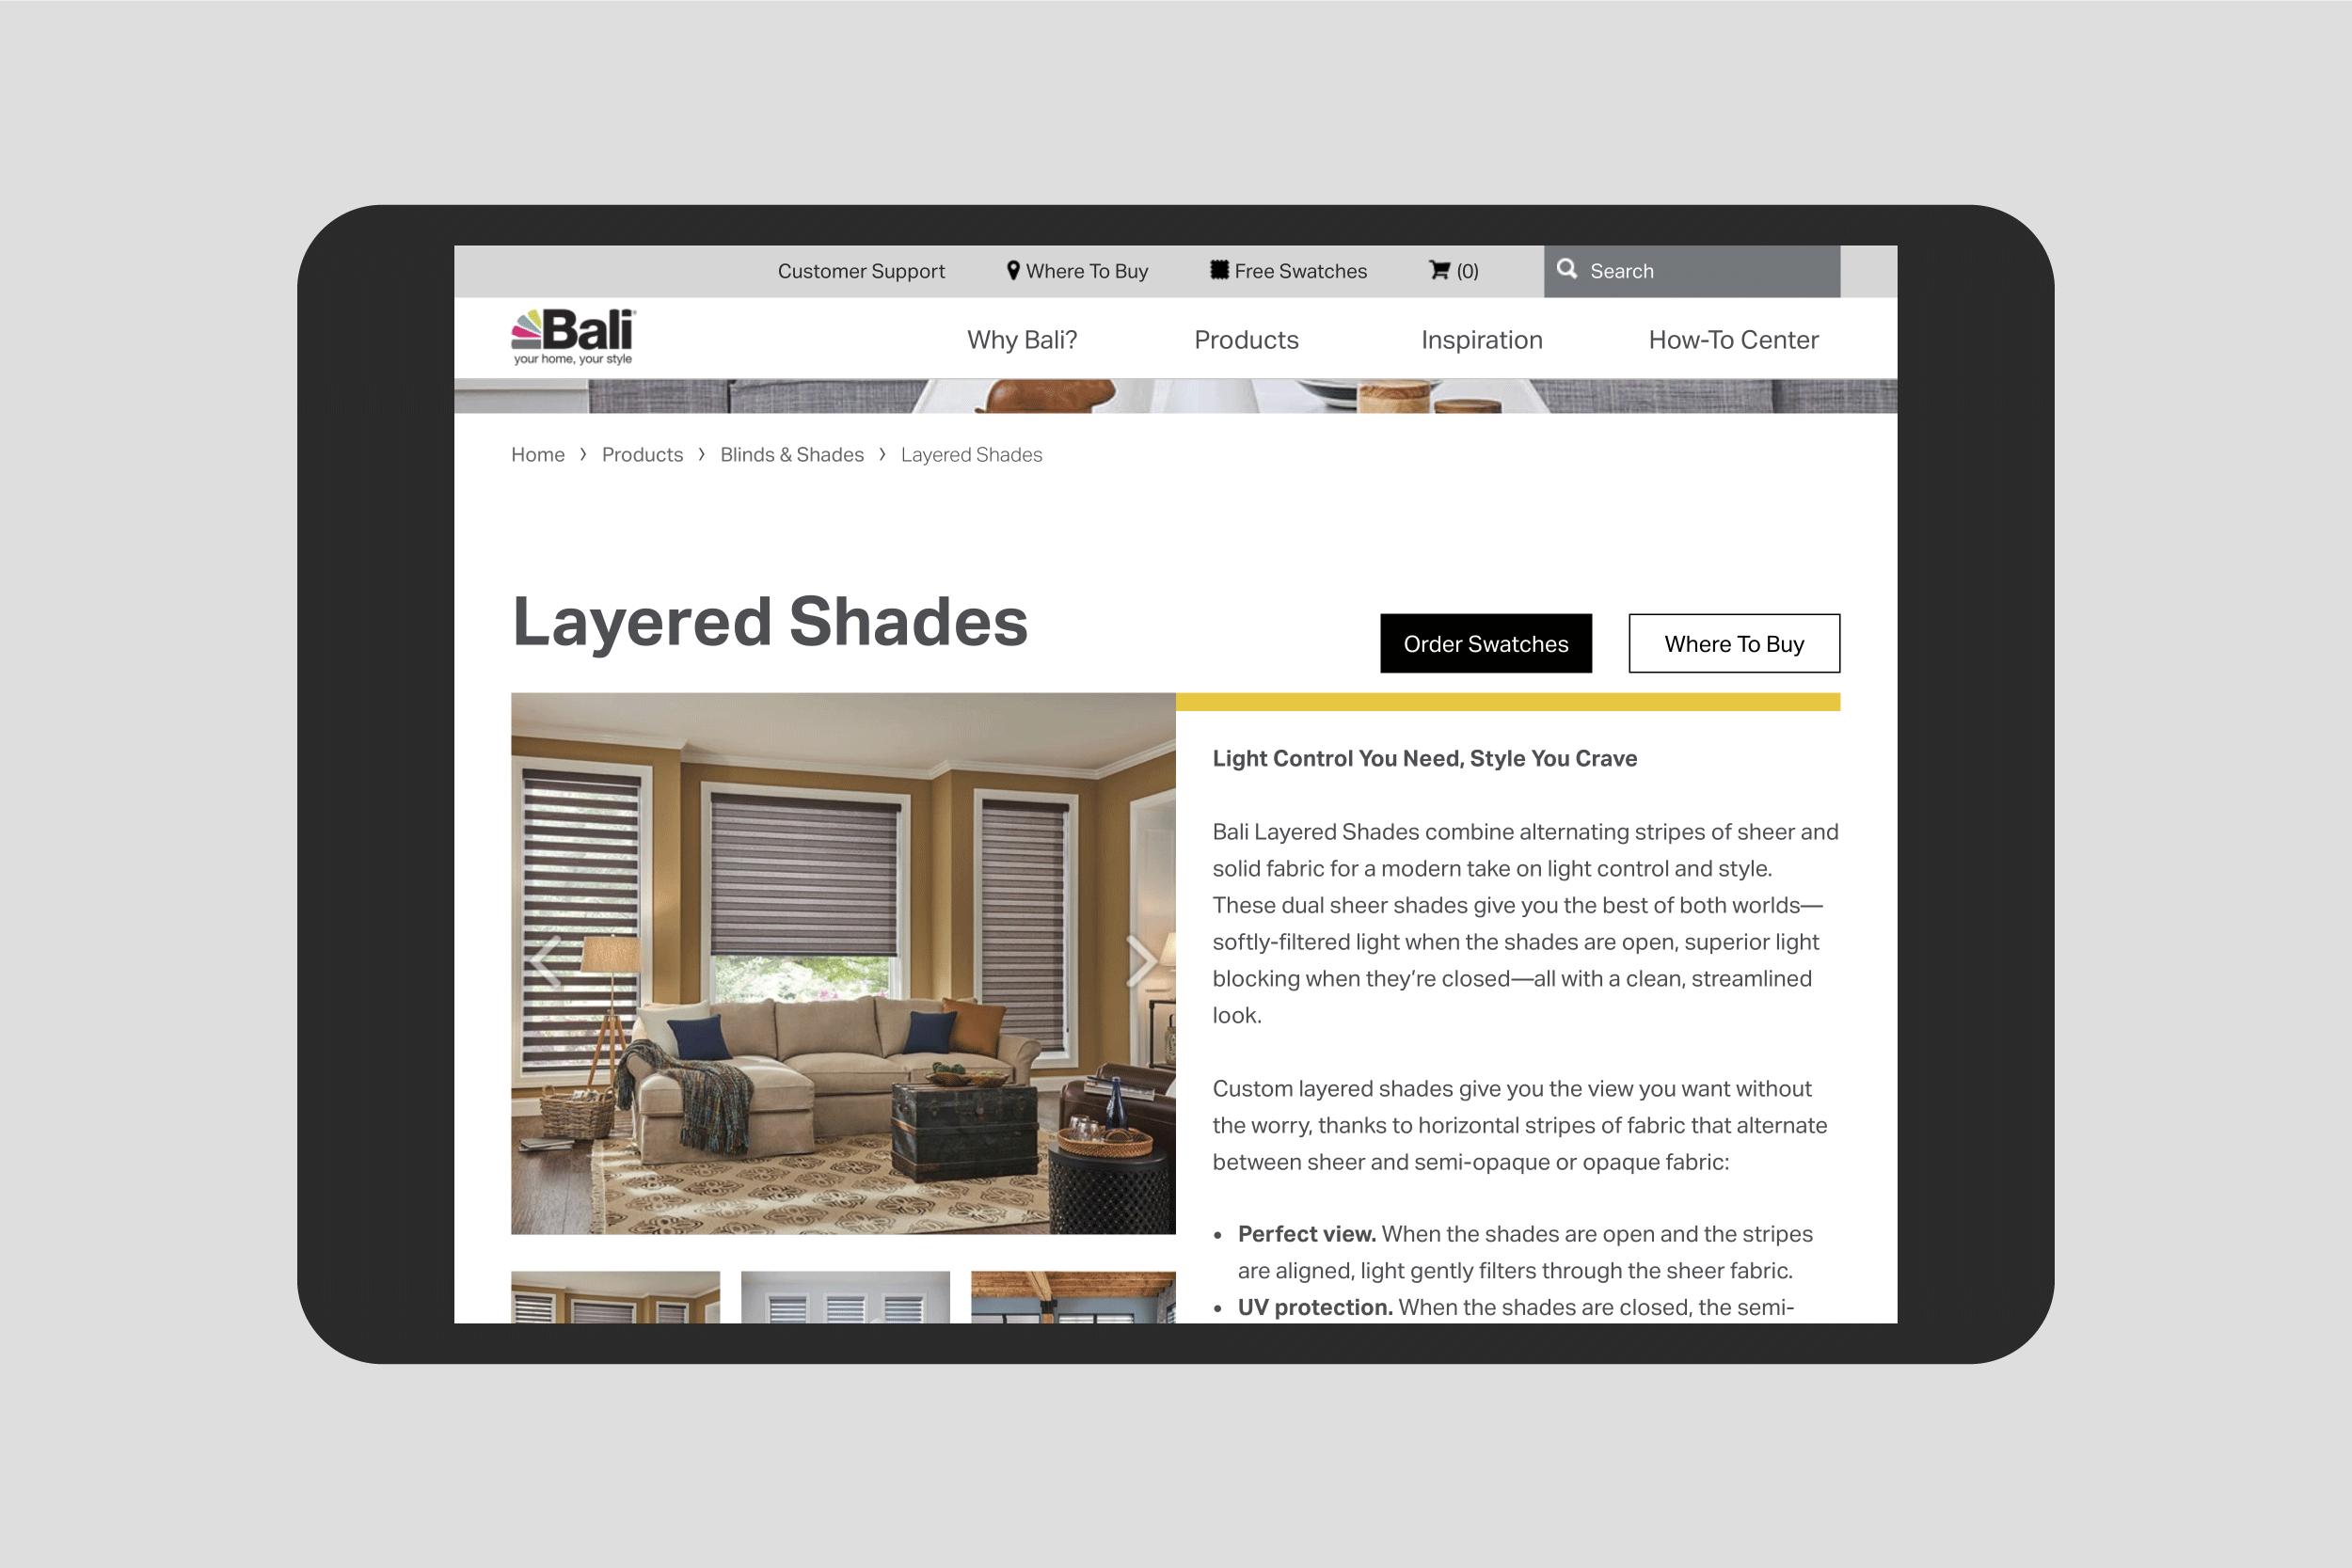 Baliblinds.com Layered Shades product page